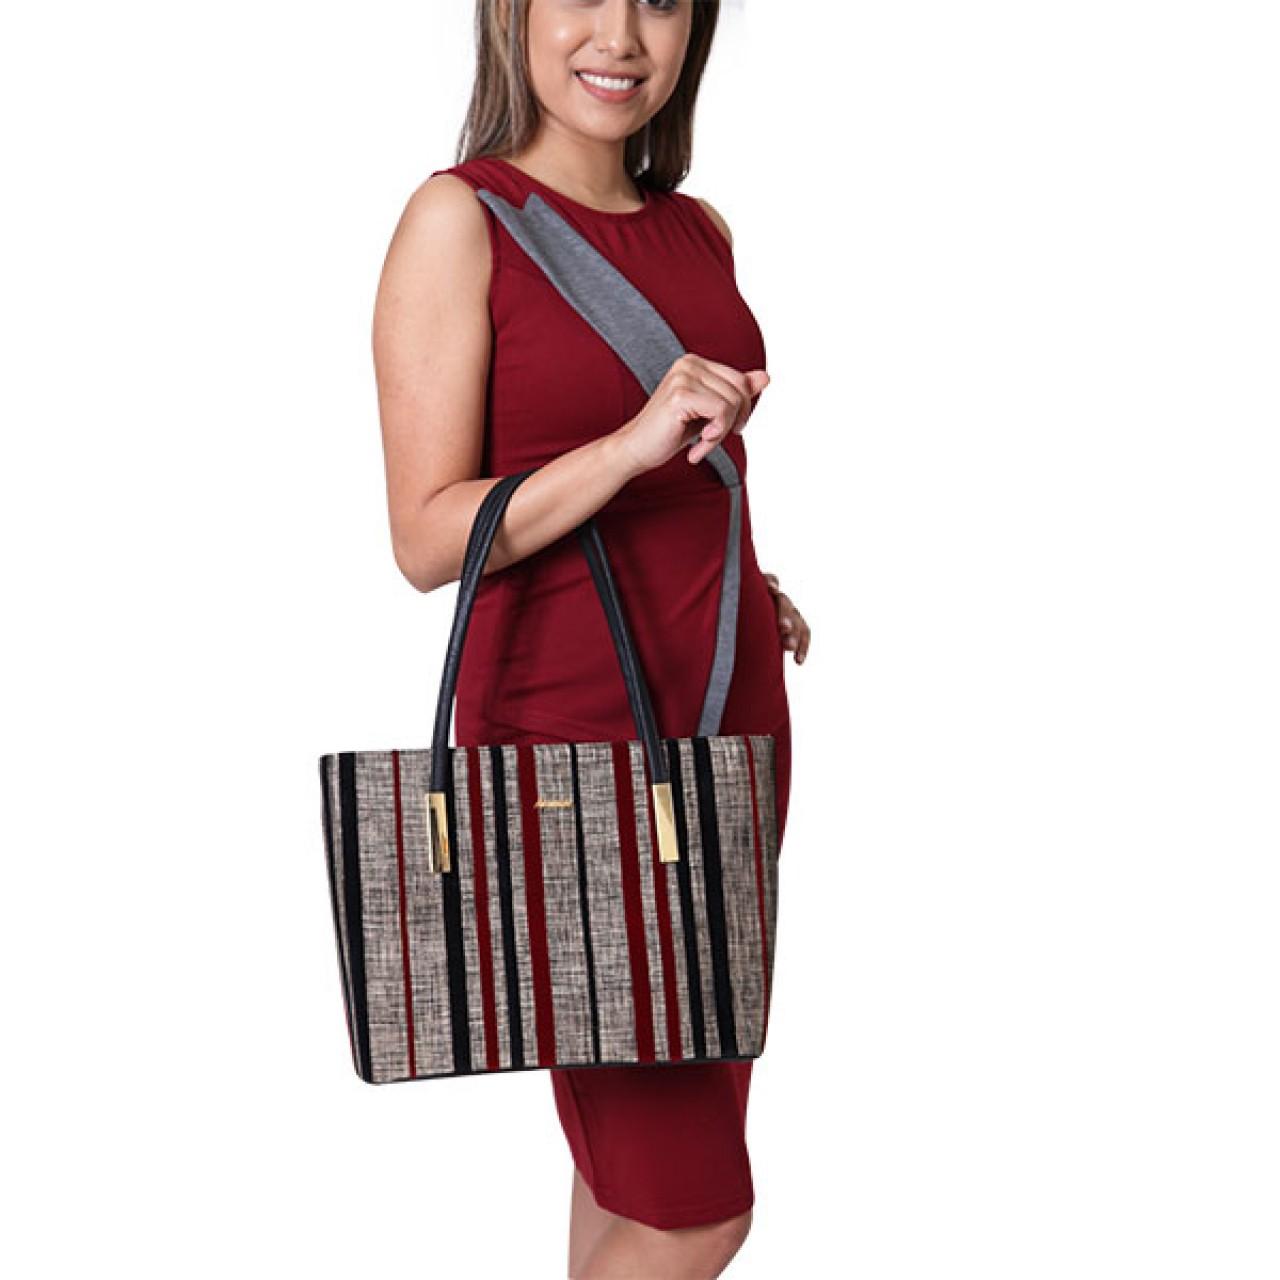 Patchwork women Maroon Sleeveless Slim Fit Pencil Dress